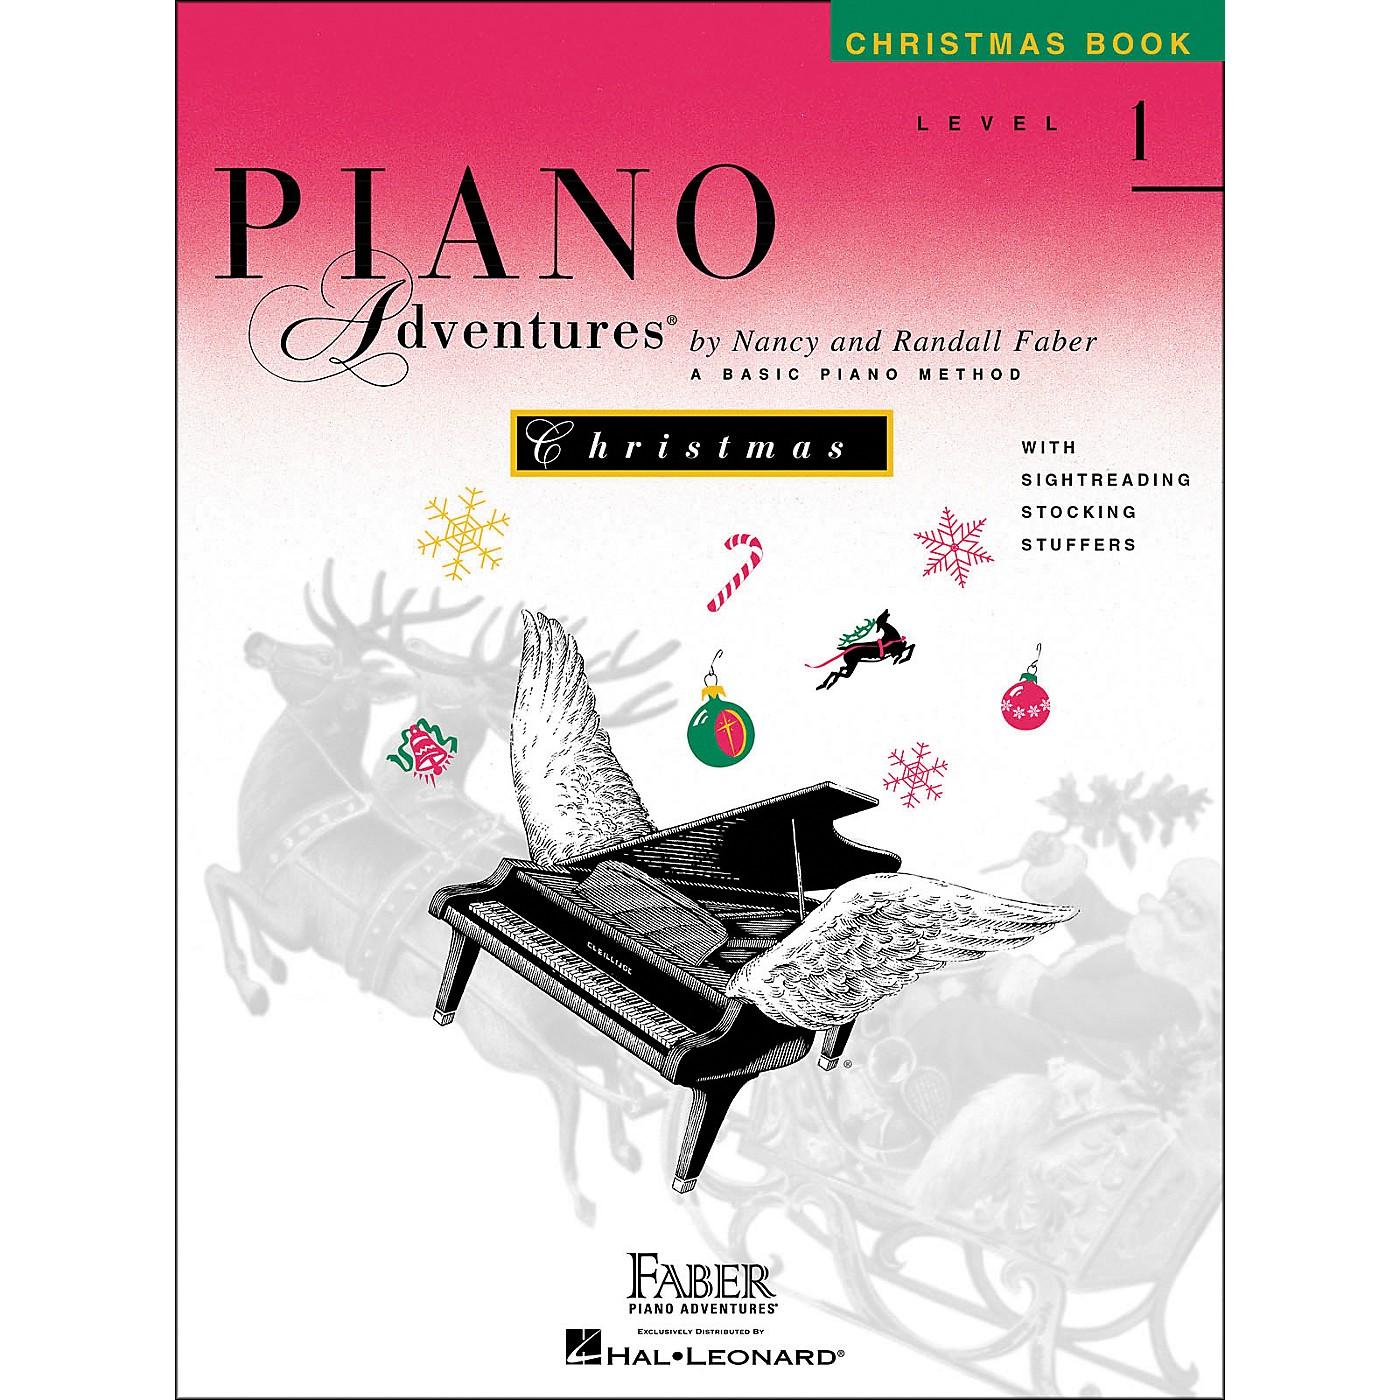 Faber Piano Adventures Piano Adventures Christmas Book Level 1 - Faber Piano thumbnail